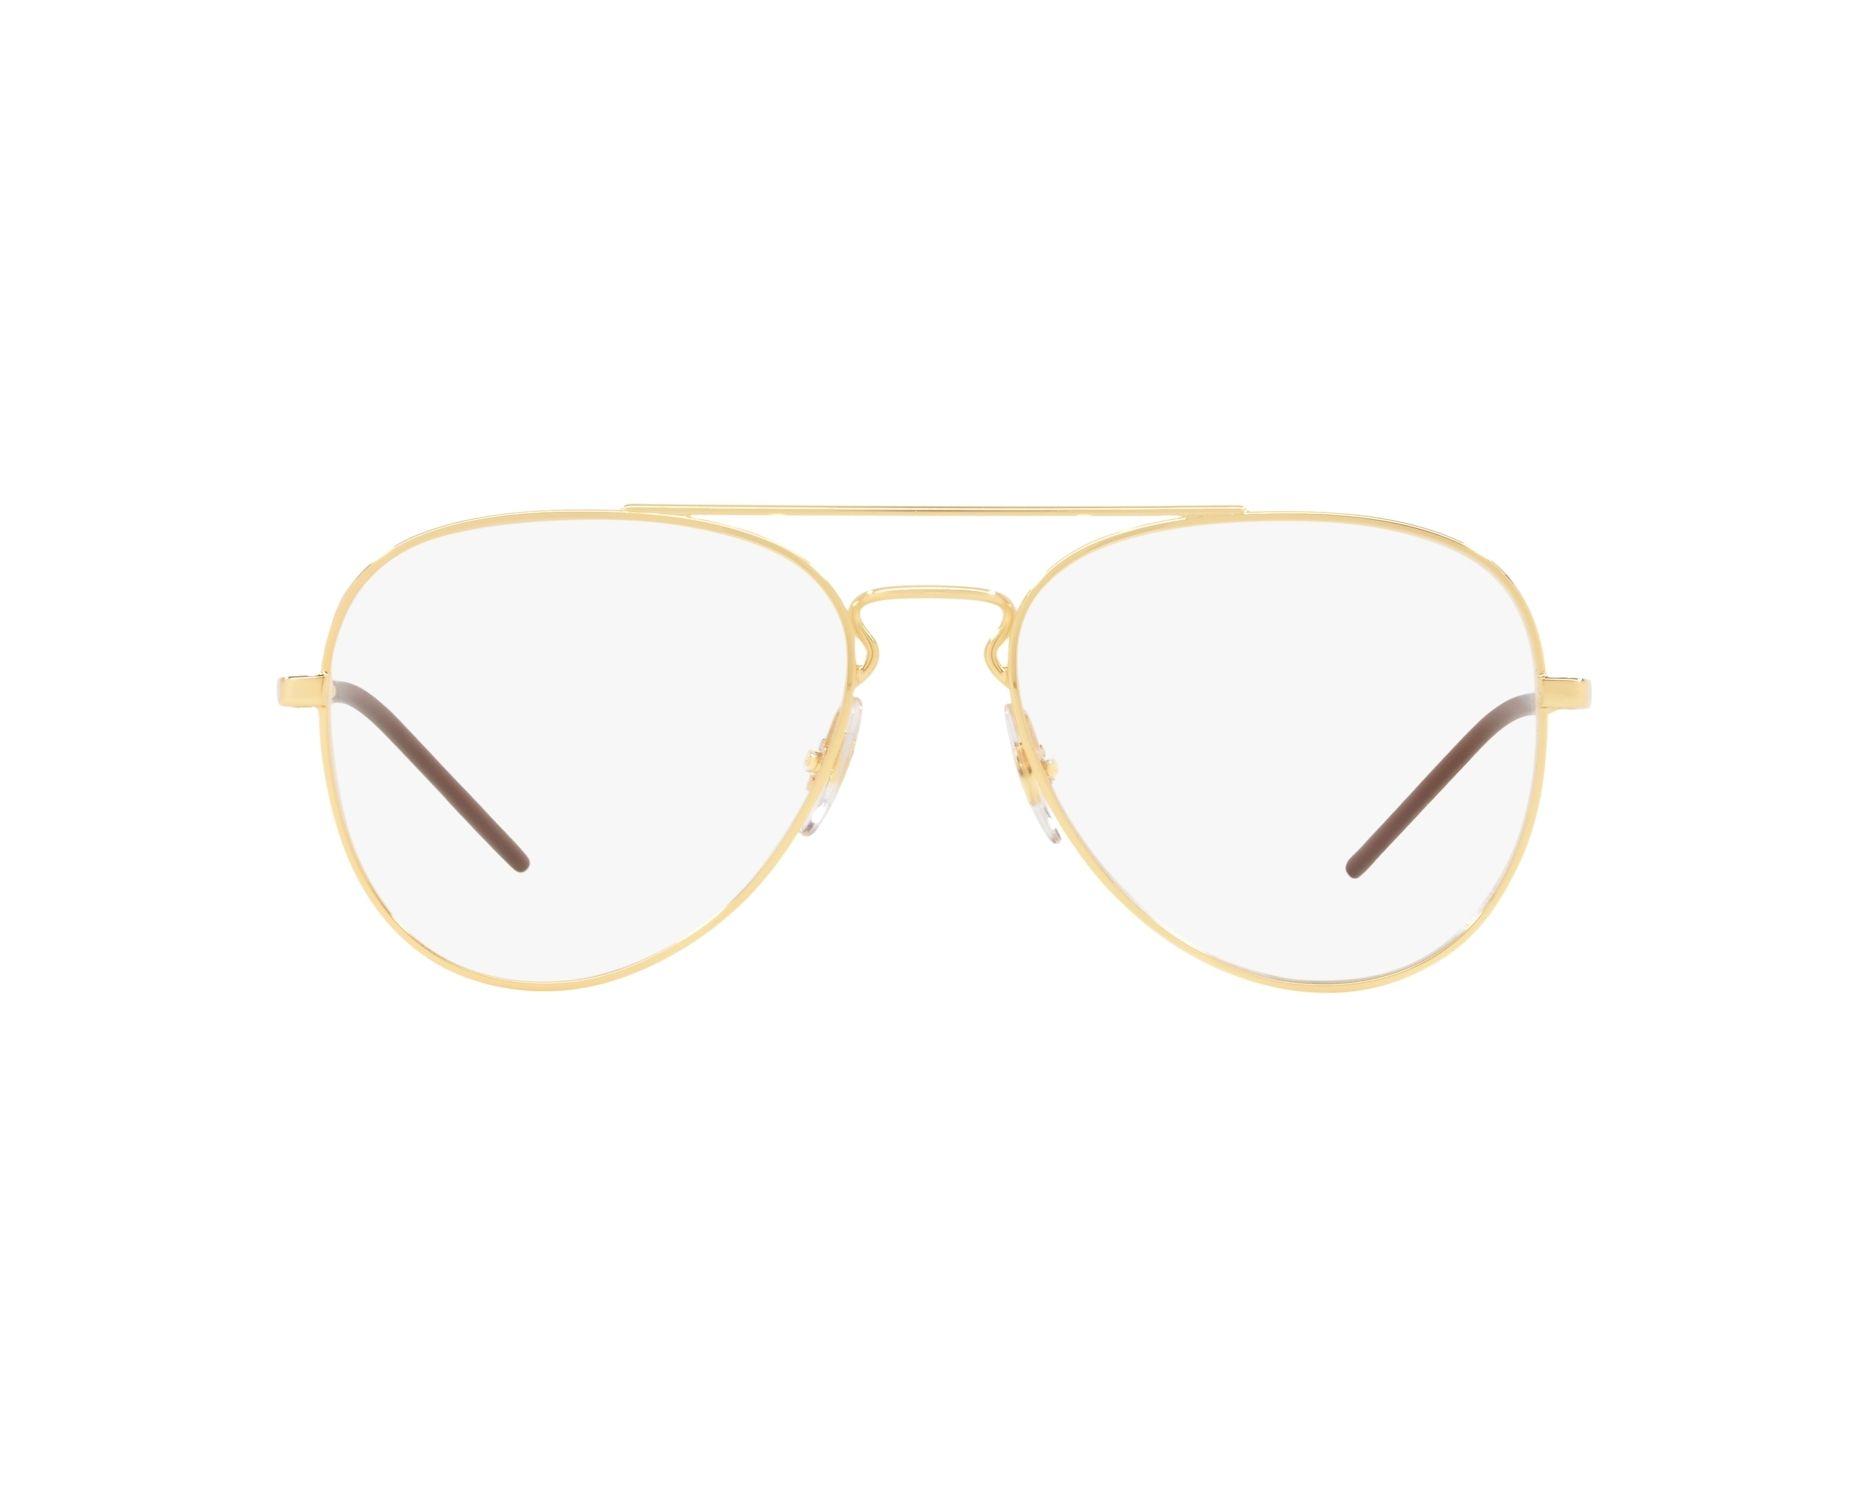 4d49daf139b eyeglasses Ray-Ban RX-6413 2500 54-17 Gold 360 degree view 1